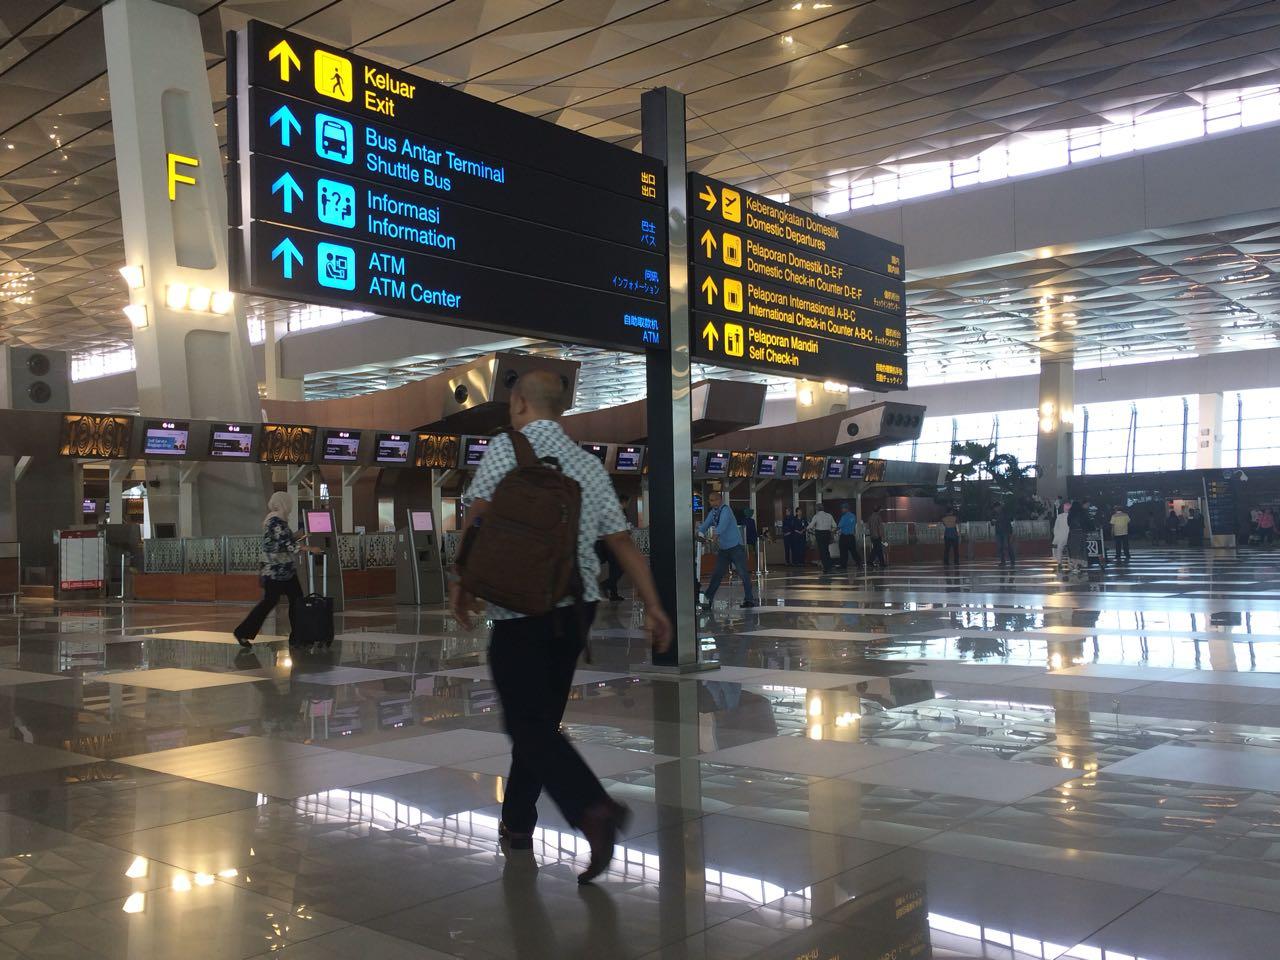 https: img.okeinfo.net content 2019 02 07 337 2014818 6-penerbangan-dari-bandara-soetta-ke-surabaya-delay-ini-penyebabnya-QClmeHuFbI.jpg